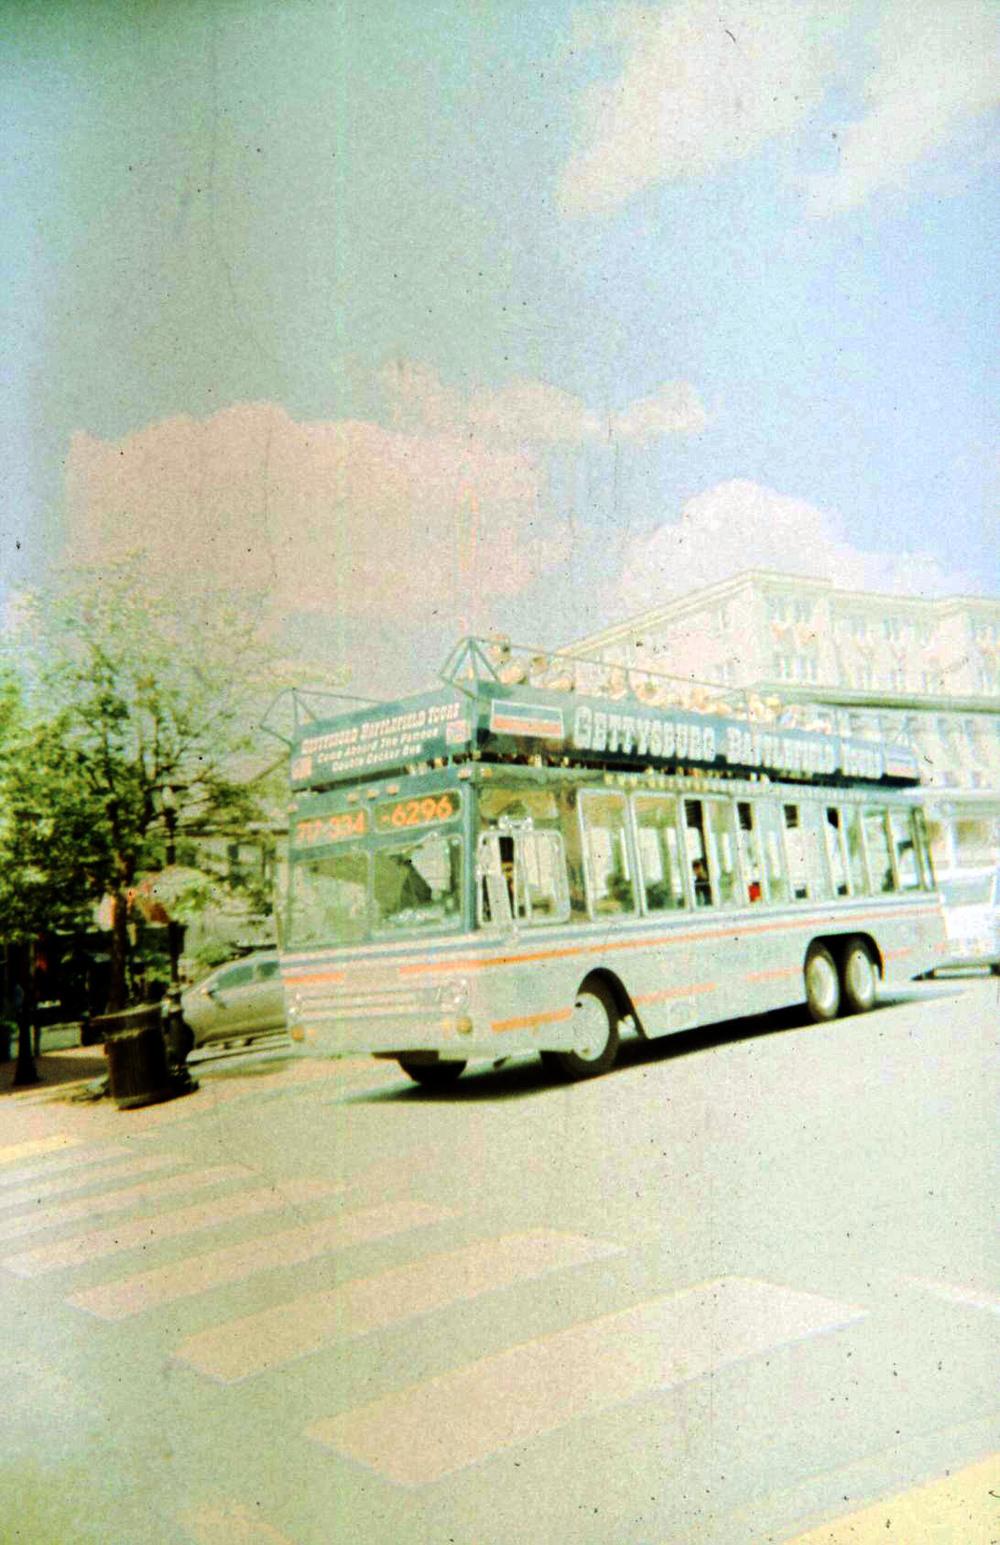 gettysburg_tour_bus.jpg